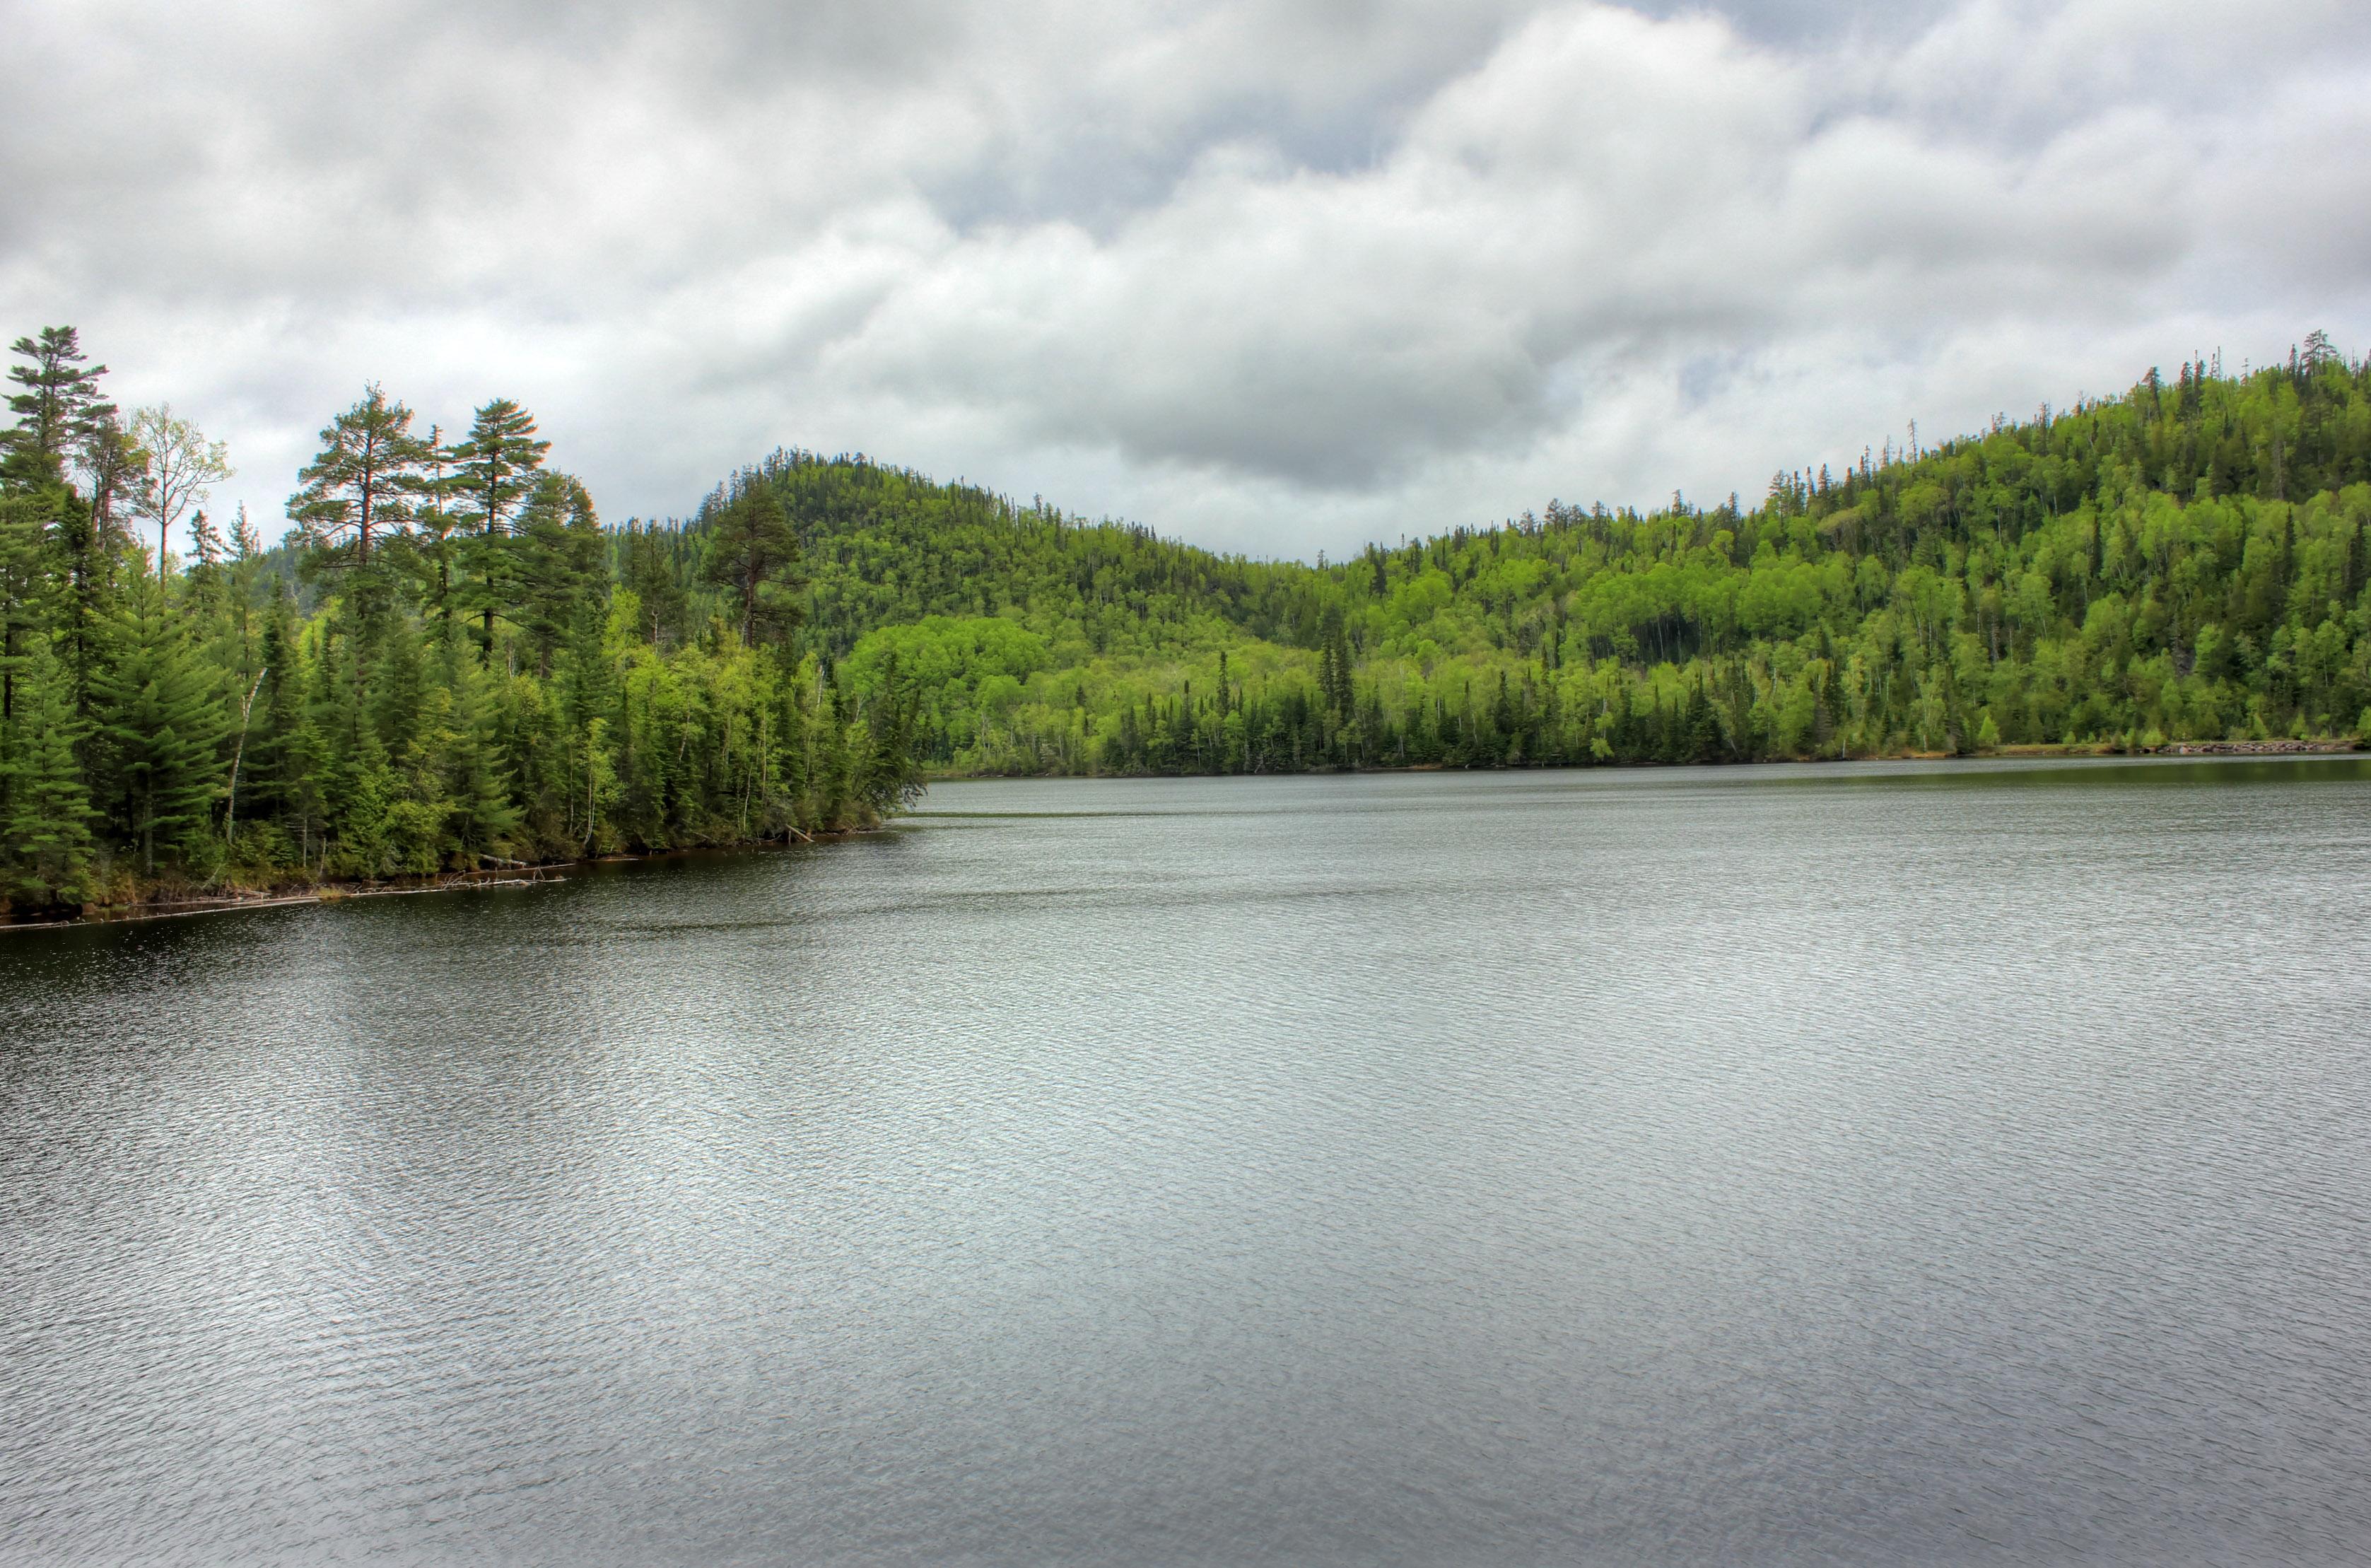 Sub-lake Of Nipigon At Lake Nipigon, Ontario, Canada Image